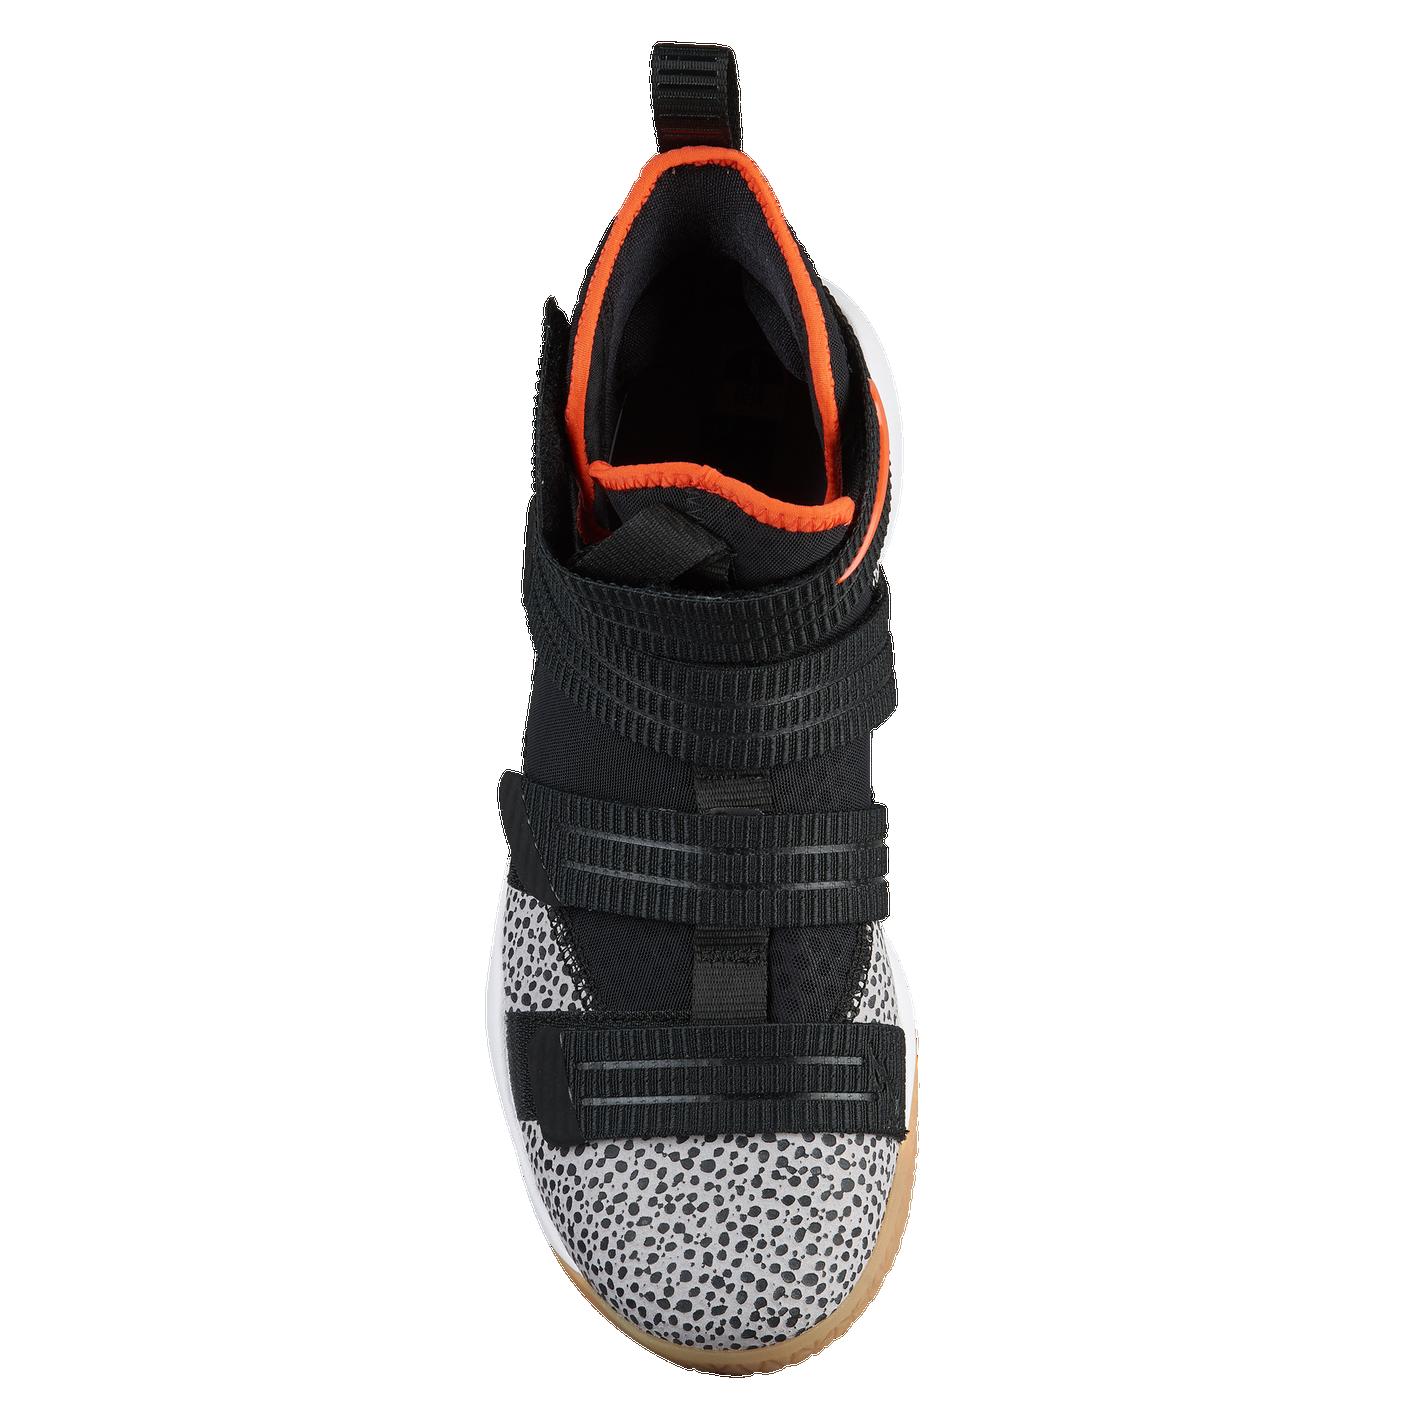 7415d1c13cd5 Nike LeBron Soldier 11 SFG - Men s - Basketball - Shoes - James ...